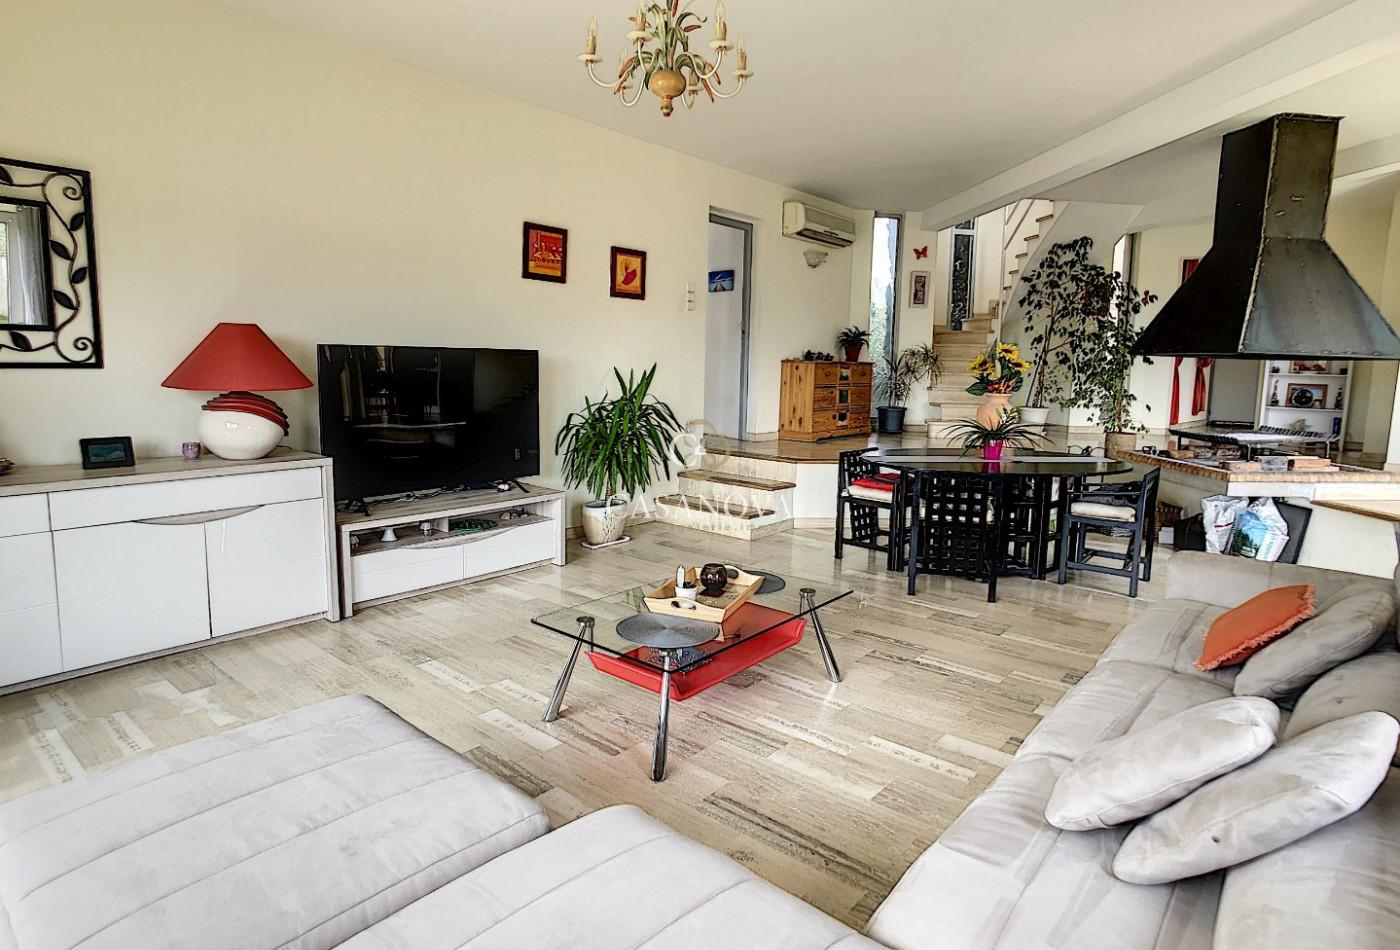 A vendre  Clermont L'herault | Réf 340138536 - Agence galerie casanova